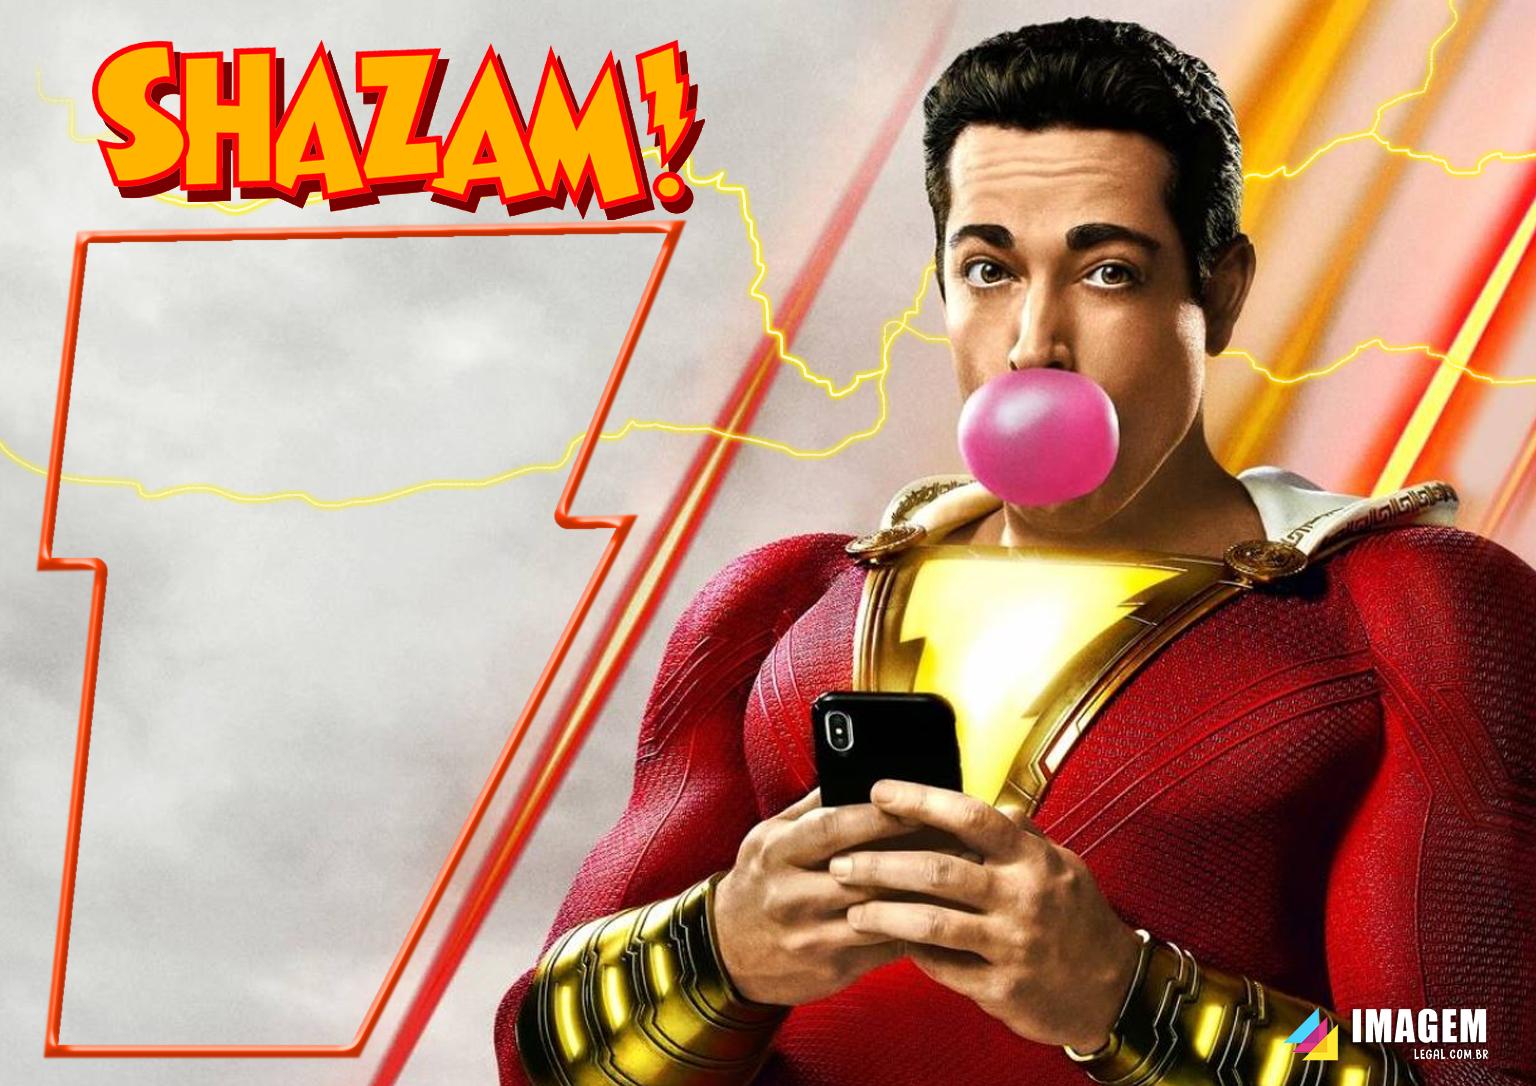 Moldura PNG Shazam